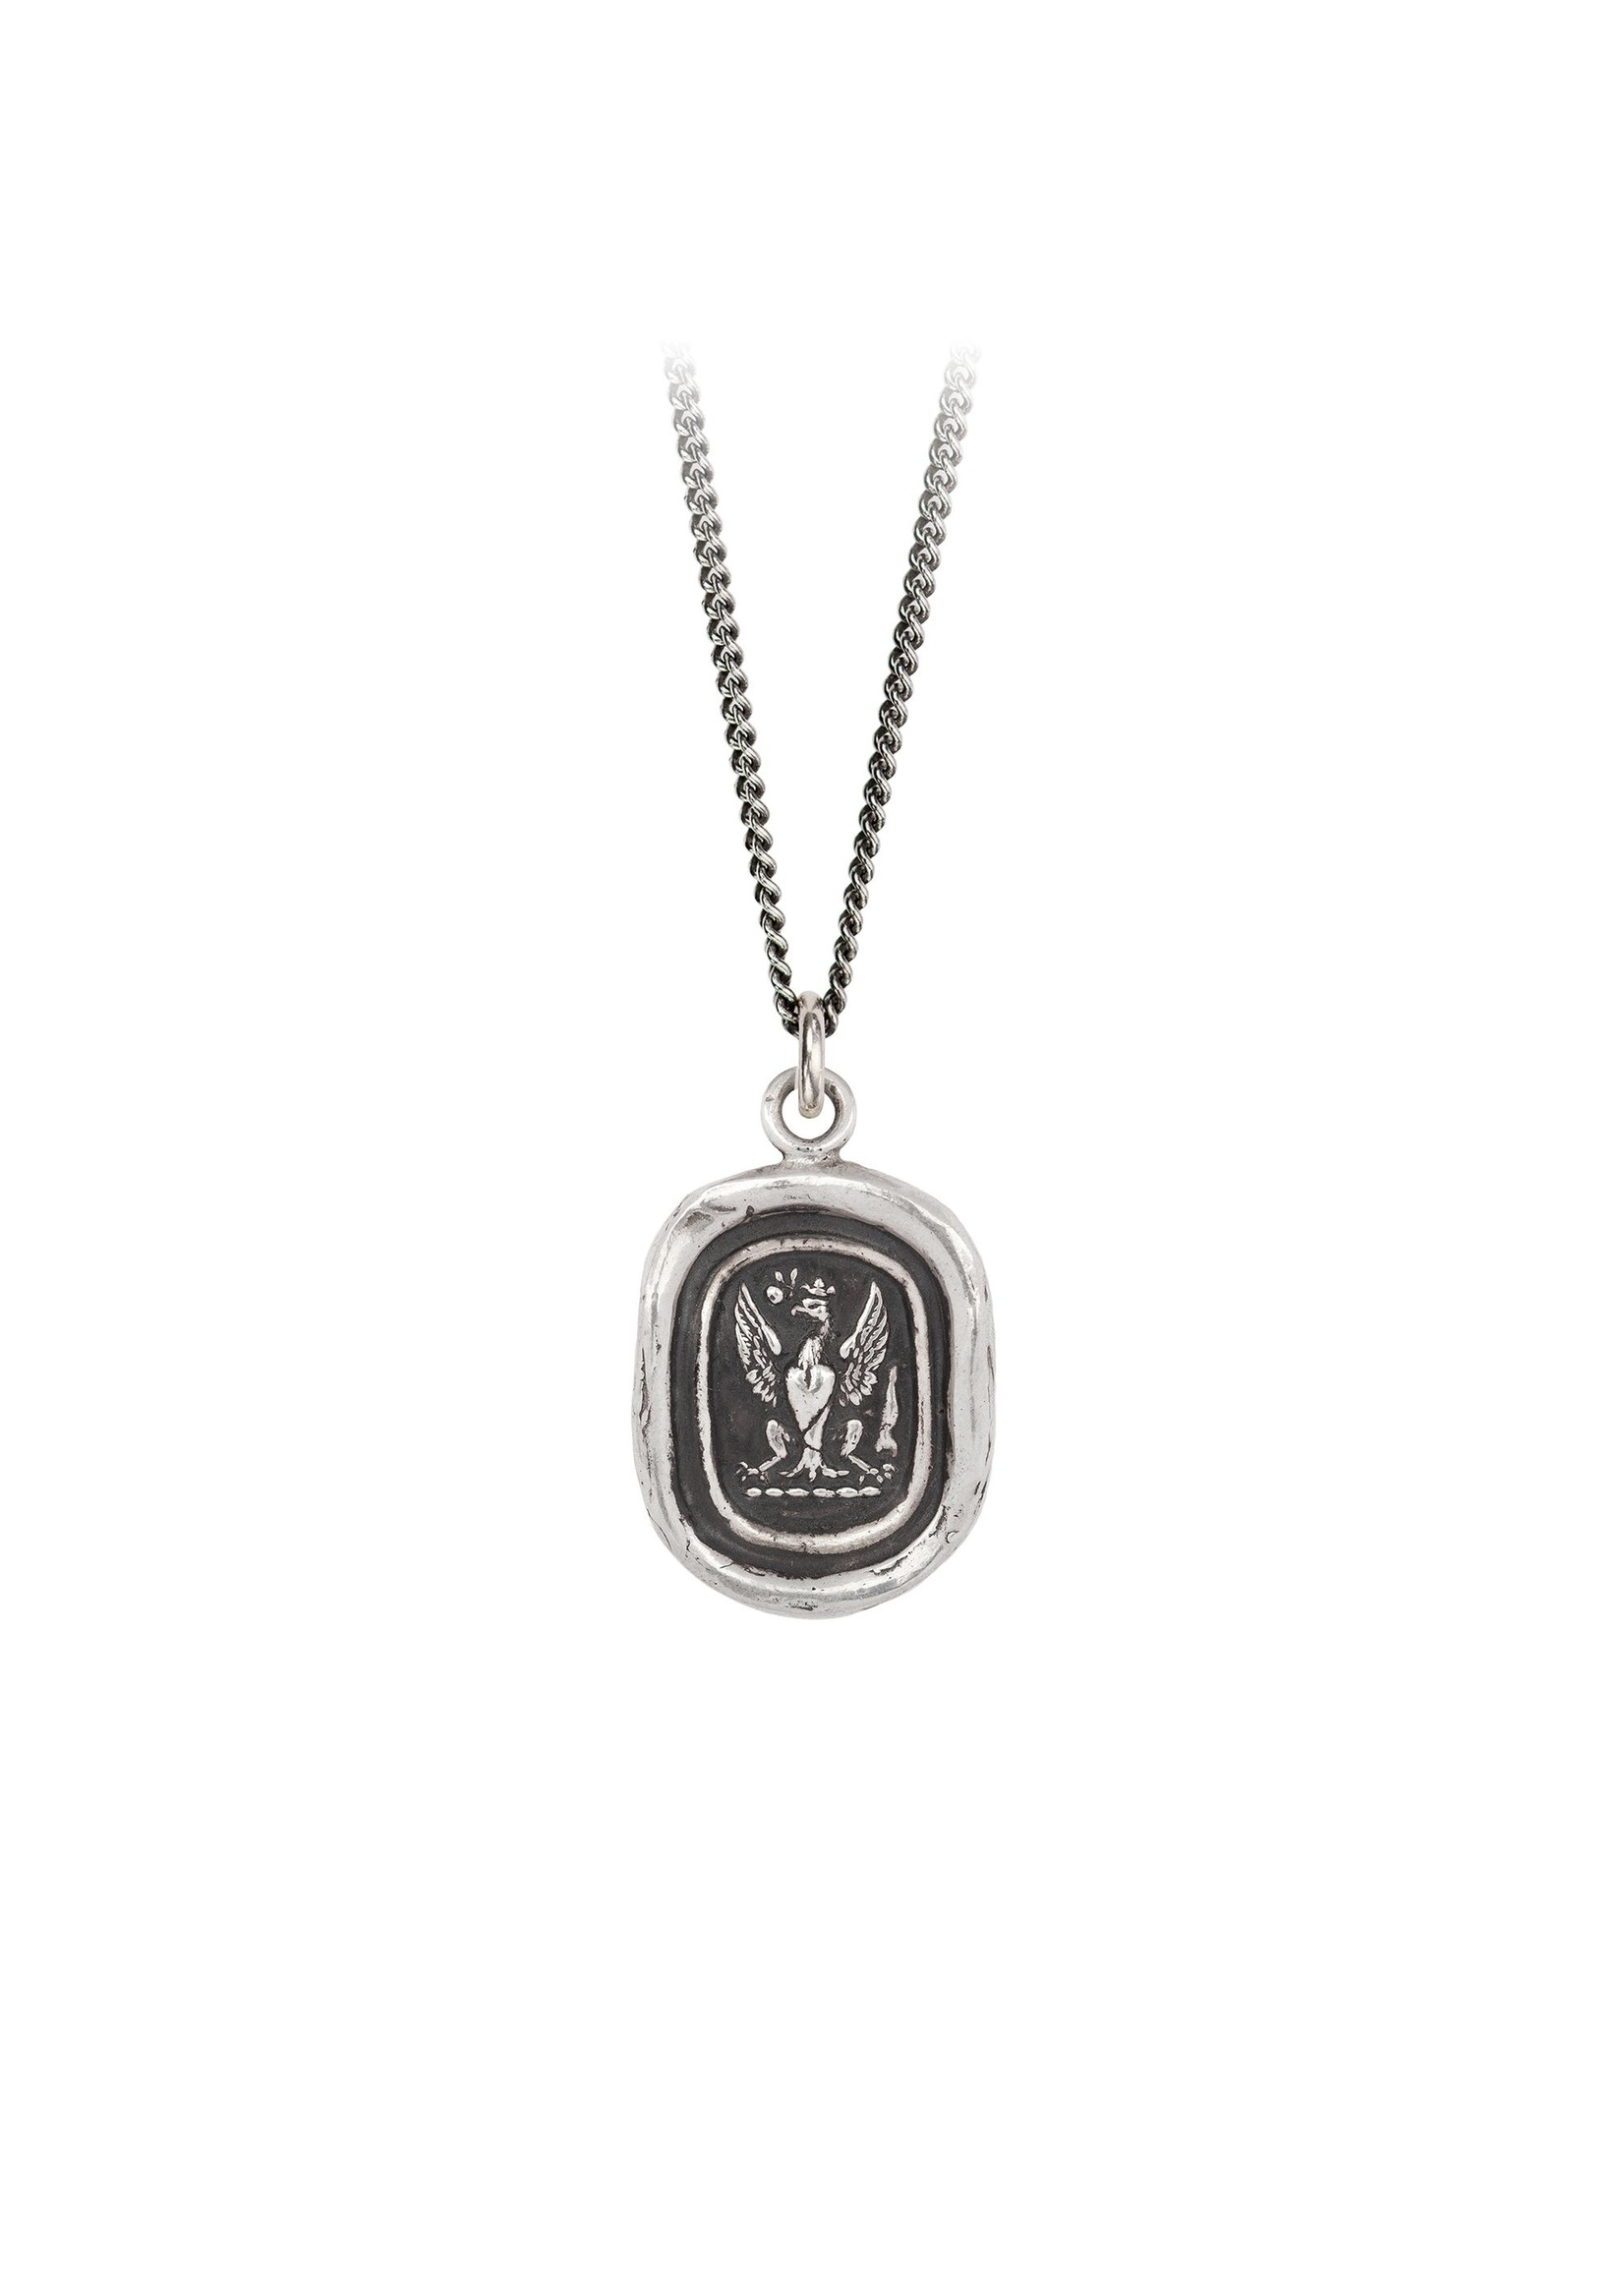 Pyrrha Follow Your Dreams Pyrrha Necklace